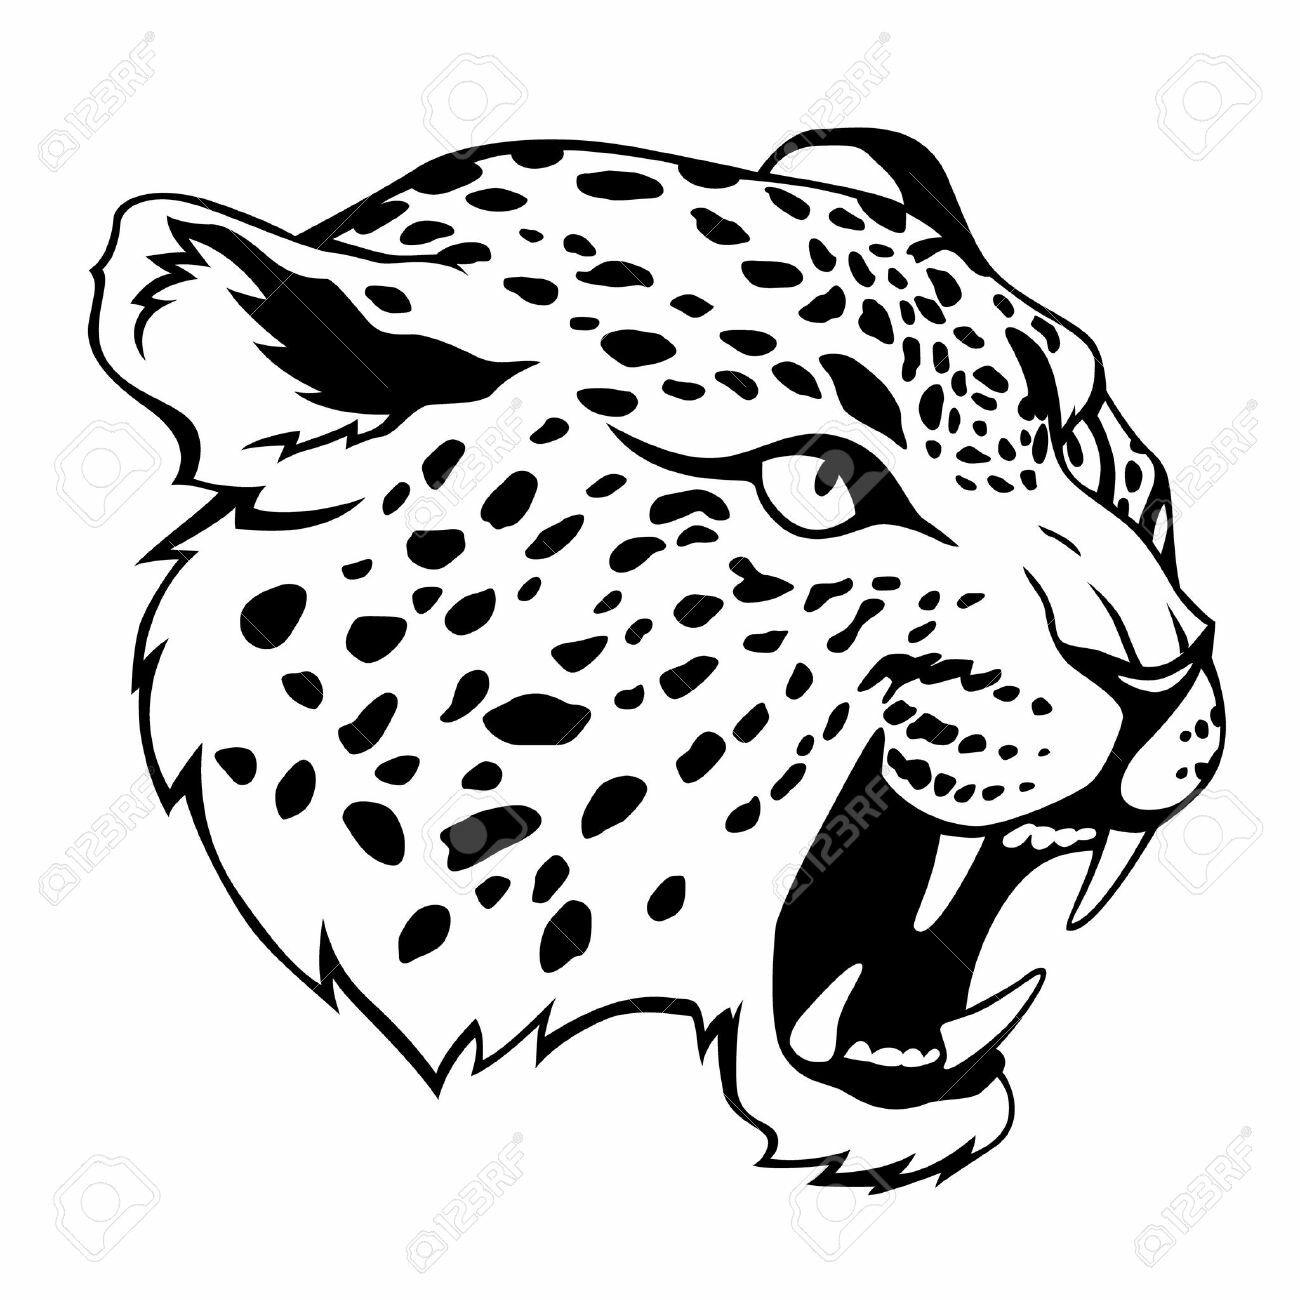 Jaguar dibujo | IMAGENES BOLSOS | Pinterest | Jaguar, Dibujo y Bolsos